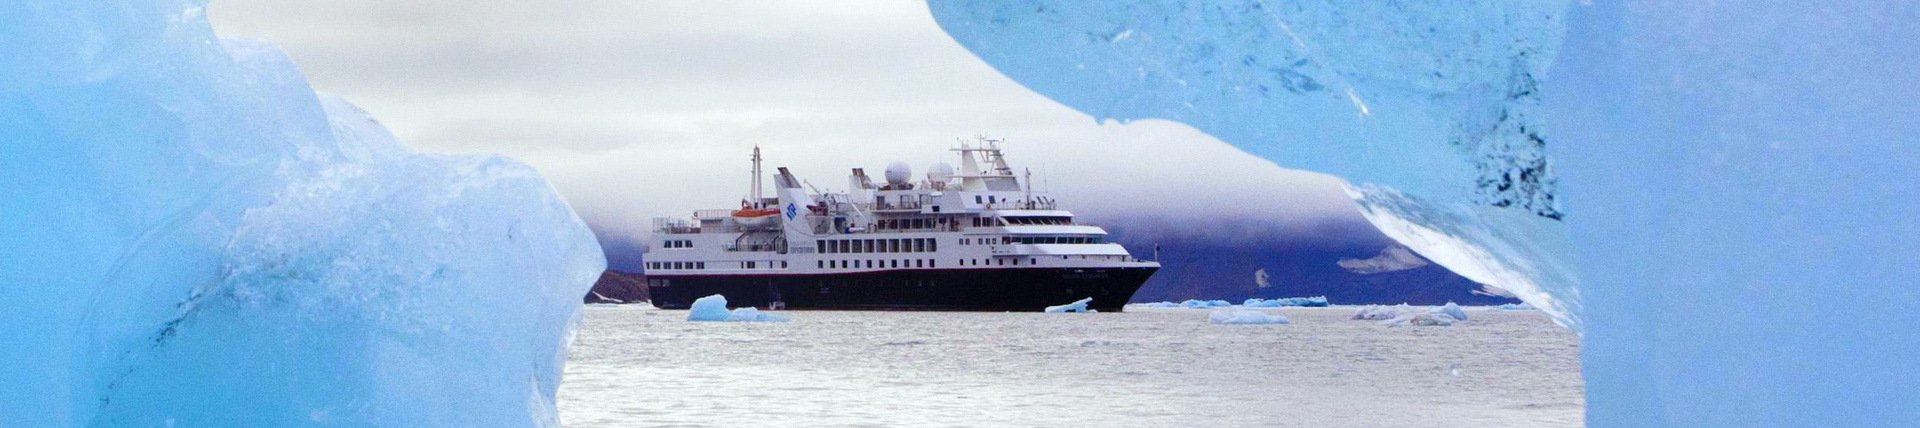 Antarctic Cruise Guide  Latin Routes